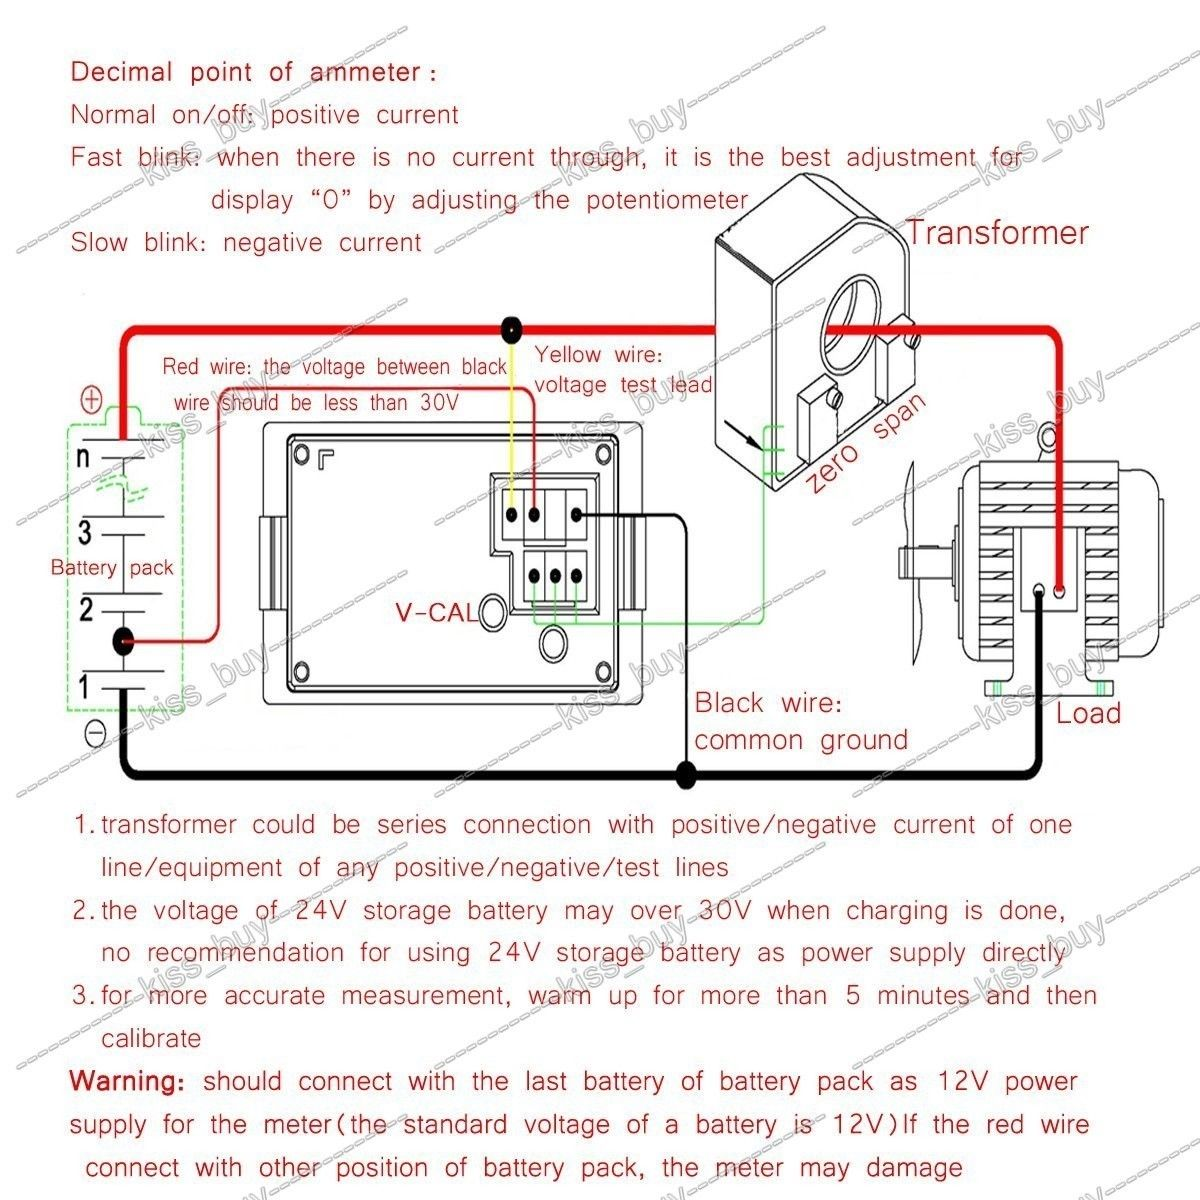 medium resolution of charge meter wiring diagram simple wiring diagram schema electric meter socket wiring diagram amp meter wiring